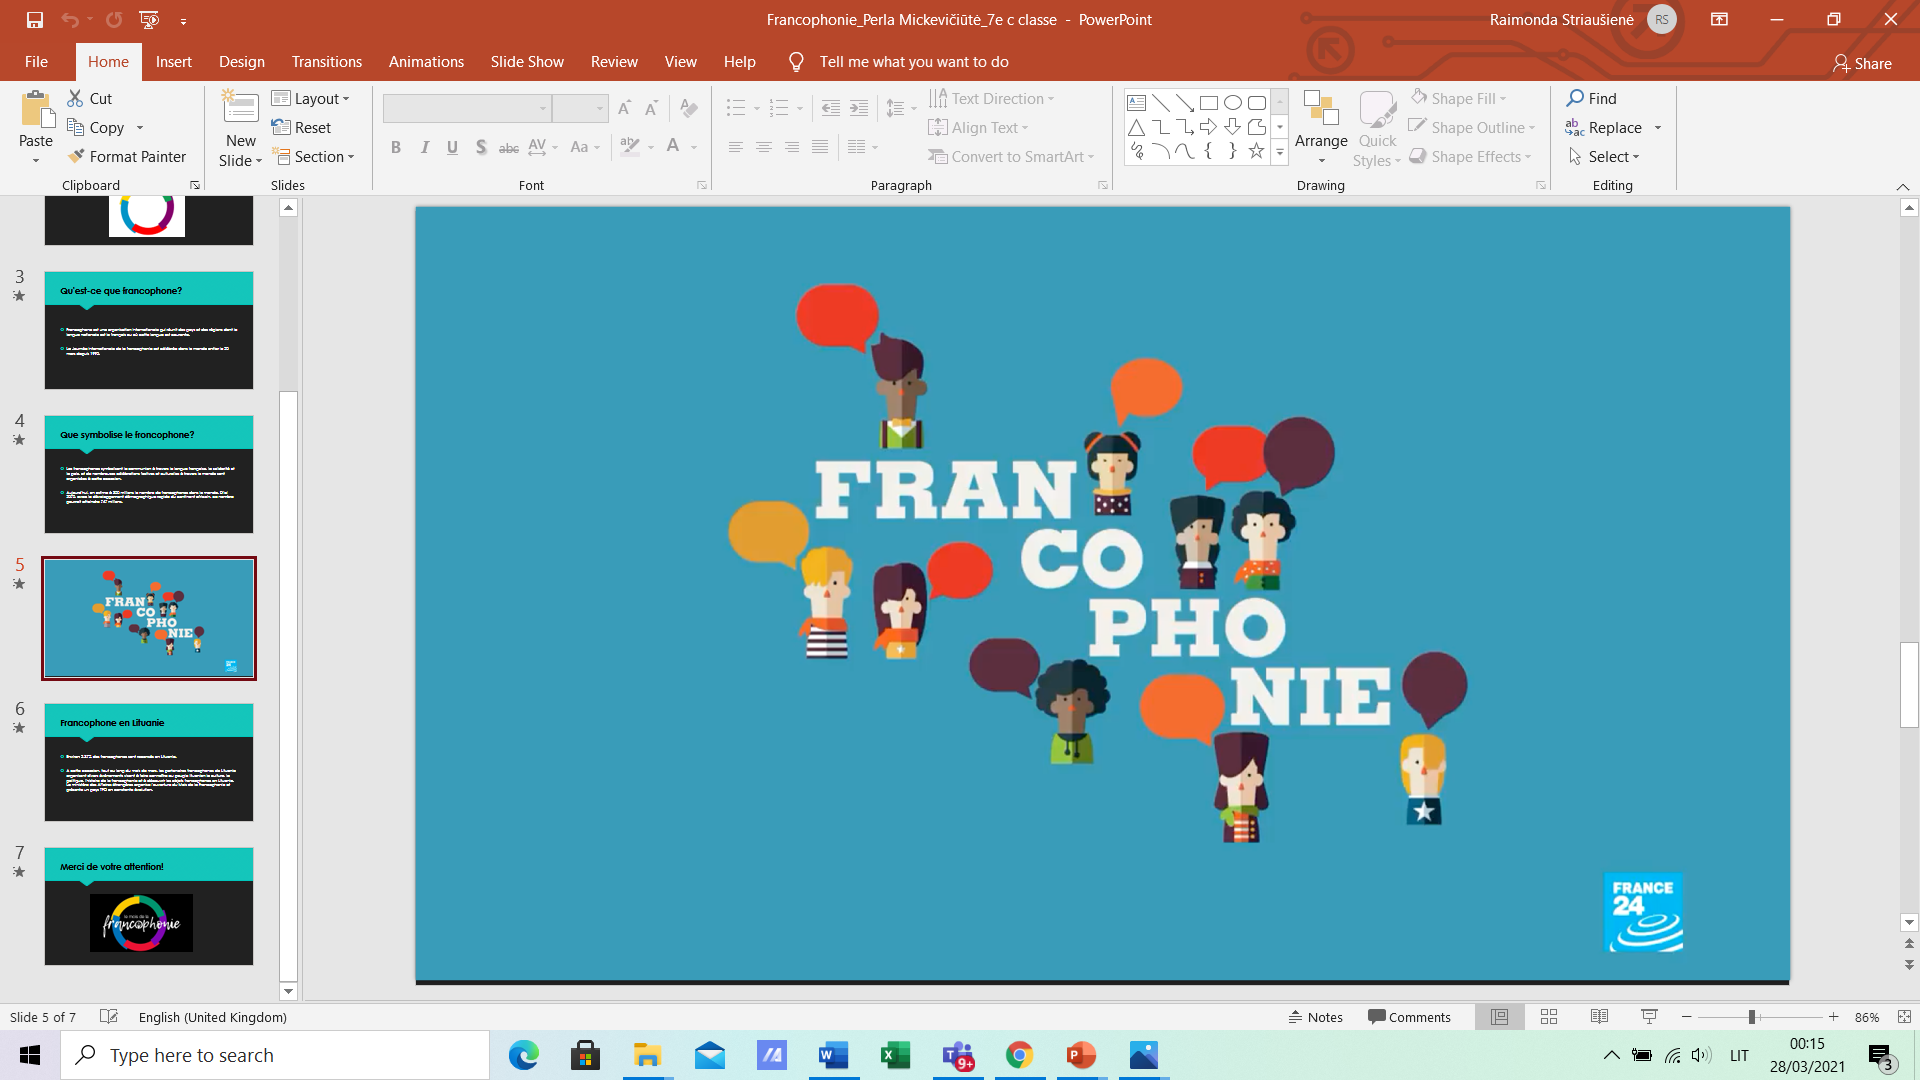 Vive la Francophonie! Tegyvuoja Frankofonija!